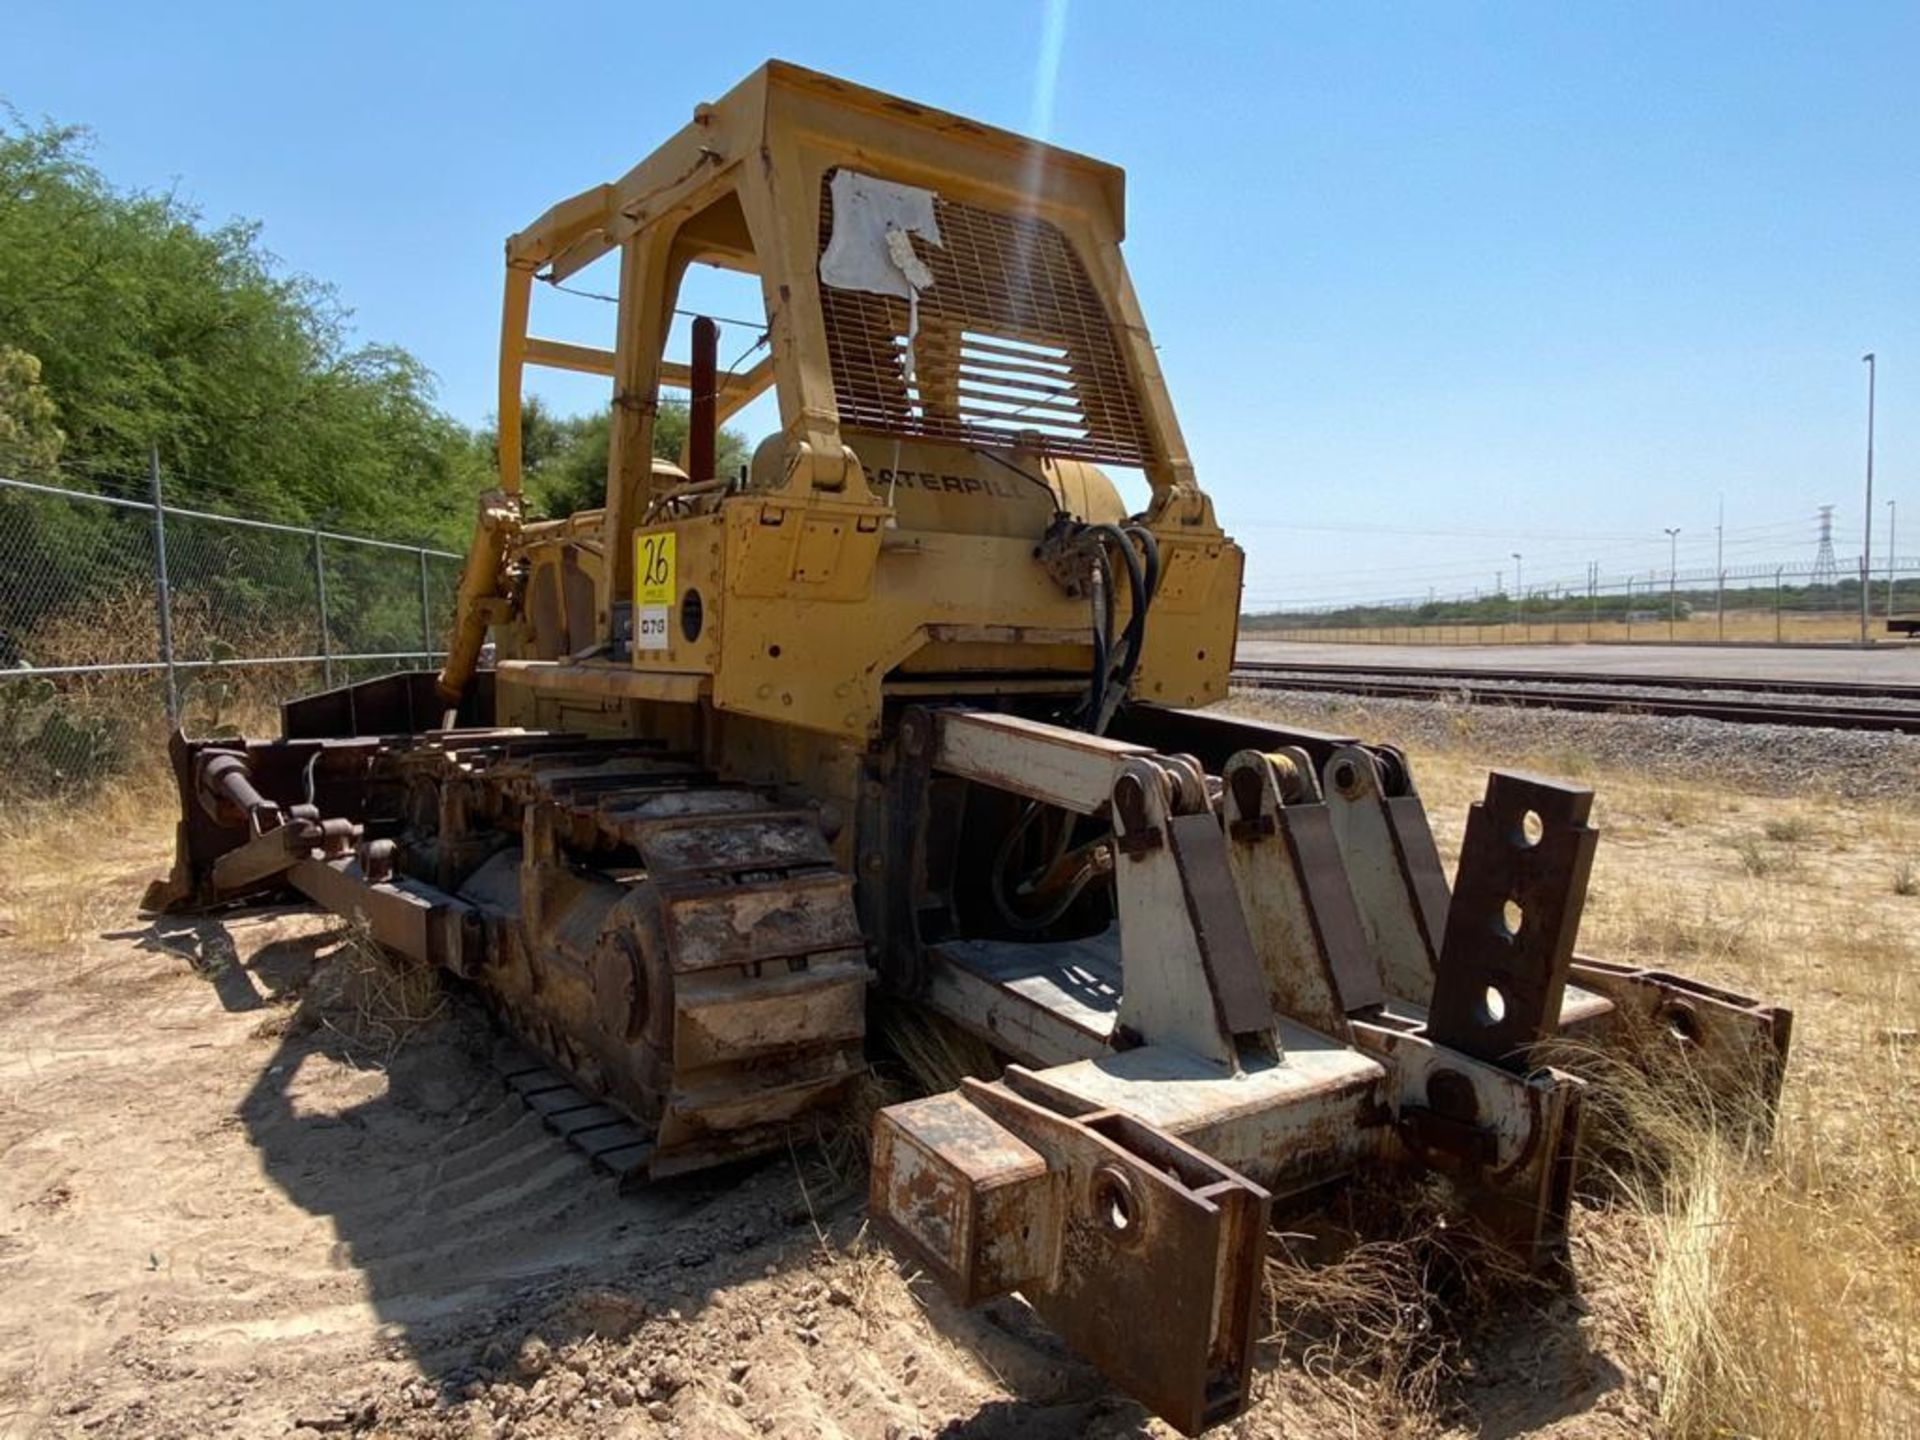 Caterpillar D7G Bulldozer, Serial number 92V5897, Diesel motor - Image 12 of 48